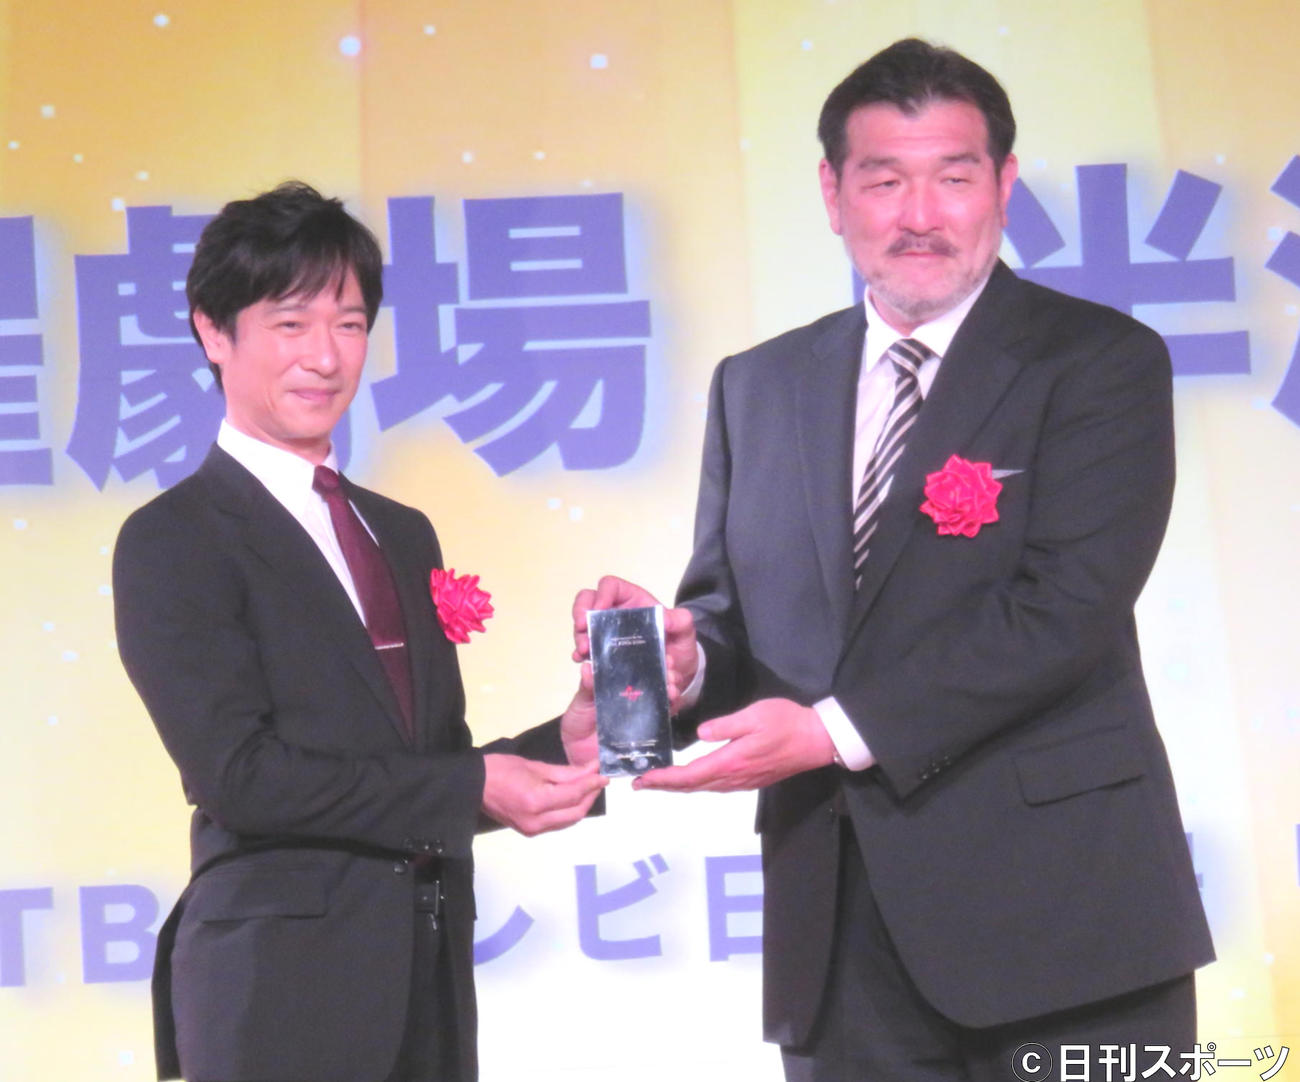 AMDアワードの優秀賞をTBS系ドラマ「半沢直樹」で受賞した主演の堺雅人(左)と演出の福沢克雄氏